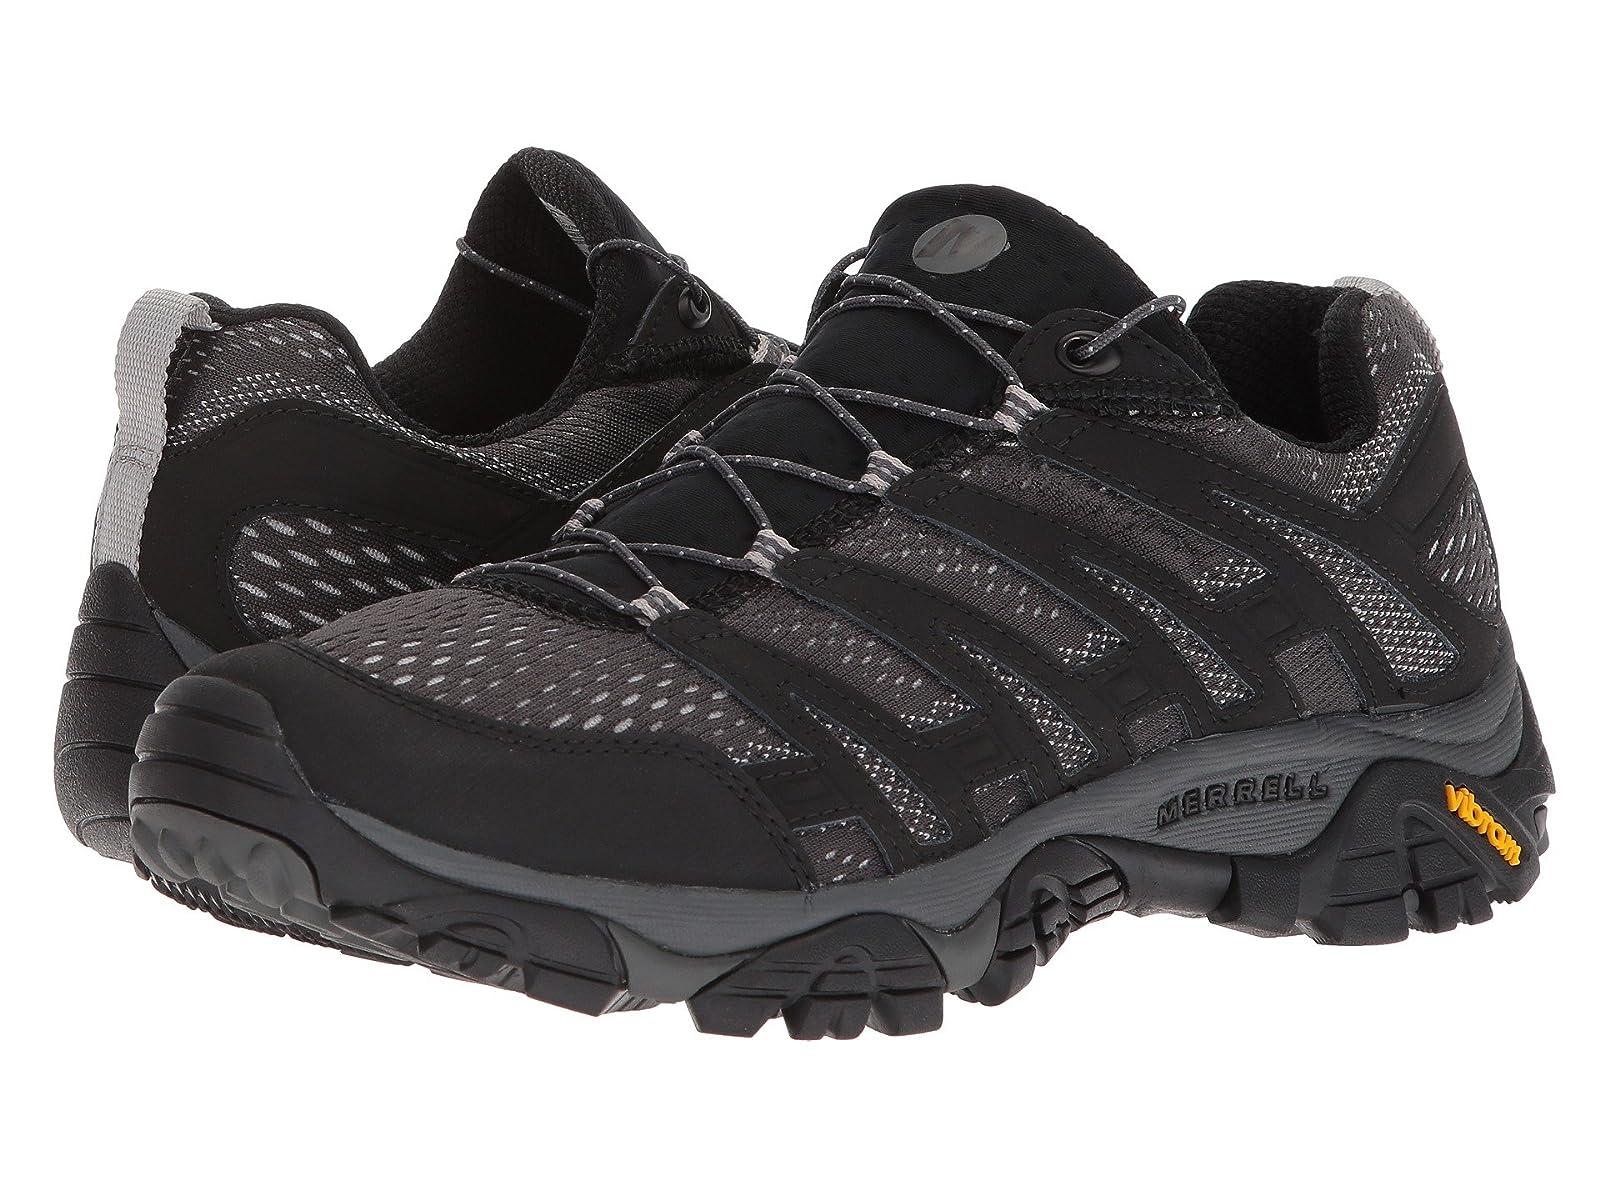 Merrell Moab 2 E-MeshAtmospheric grades have affordable shoes